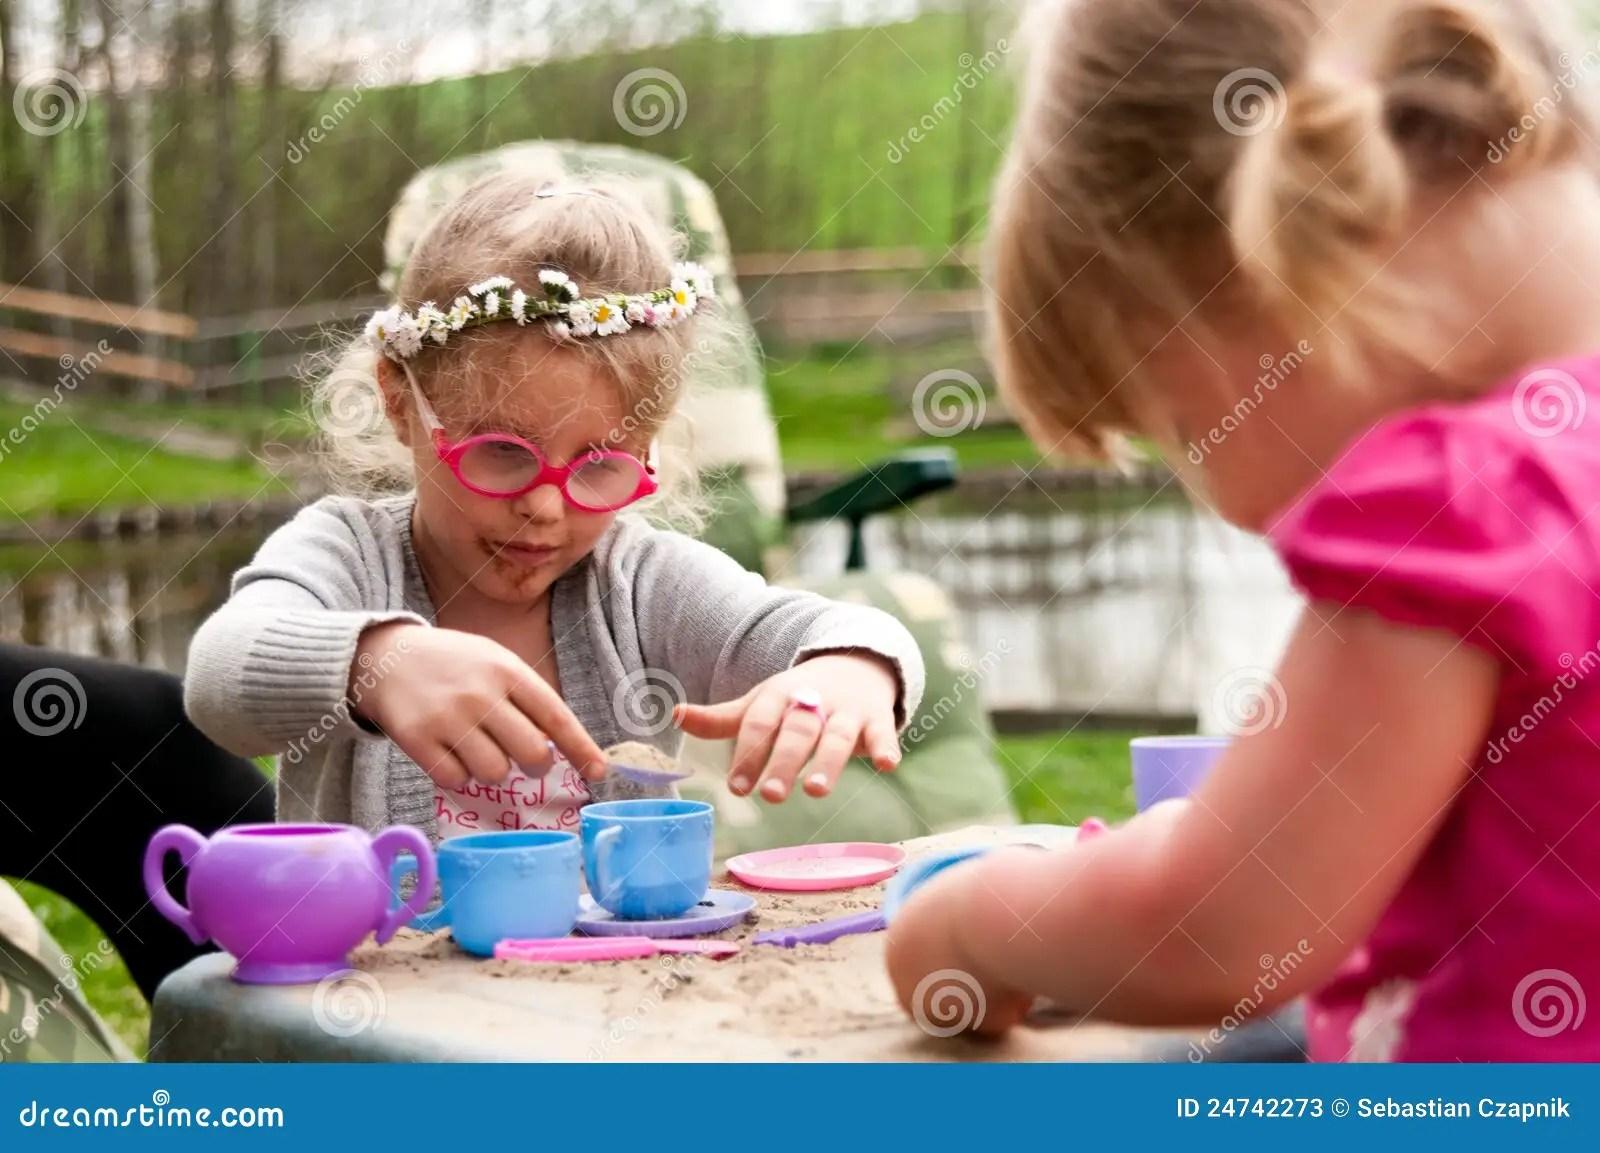 children play kitchen nantucket island little girls playing outdoors stock photos - image: 24742273